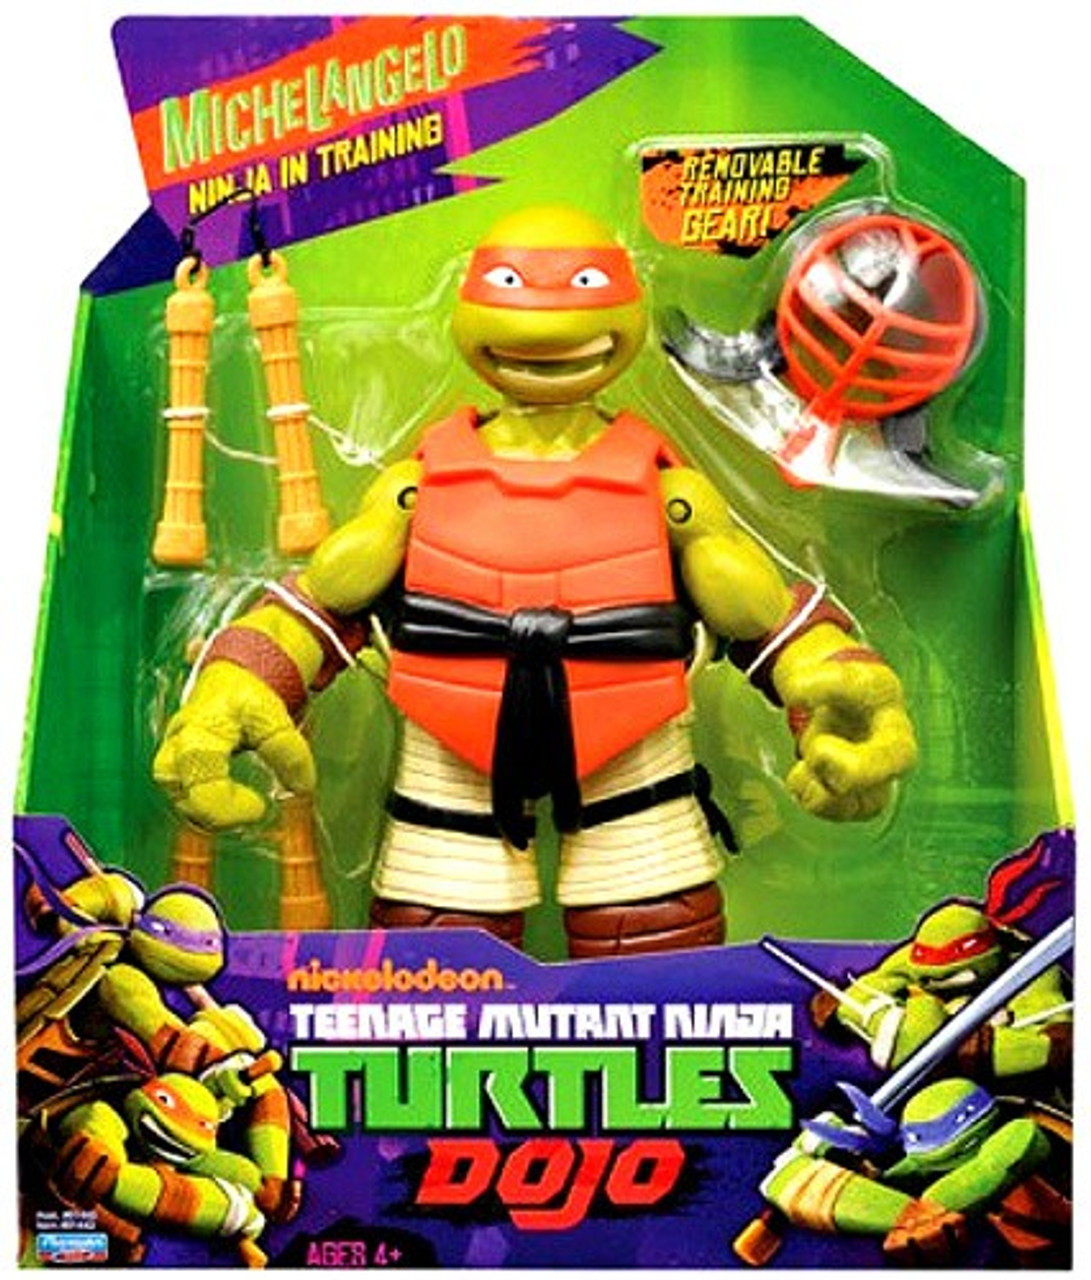 Teenage Mutant Ninja Turtles Nickelodeon Dojo Michelangelo Action Figure